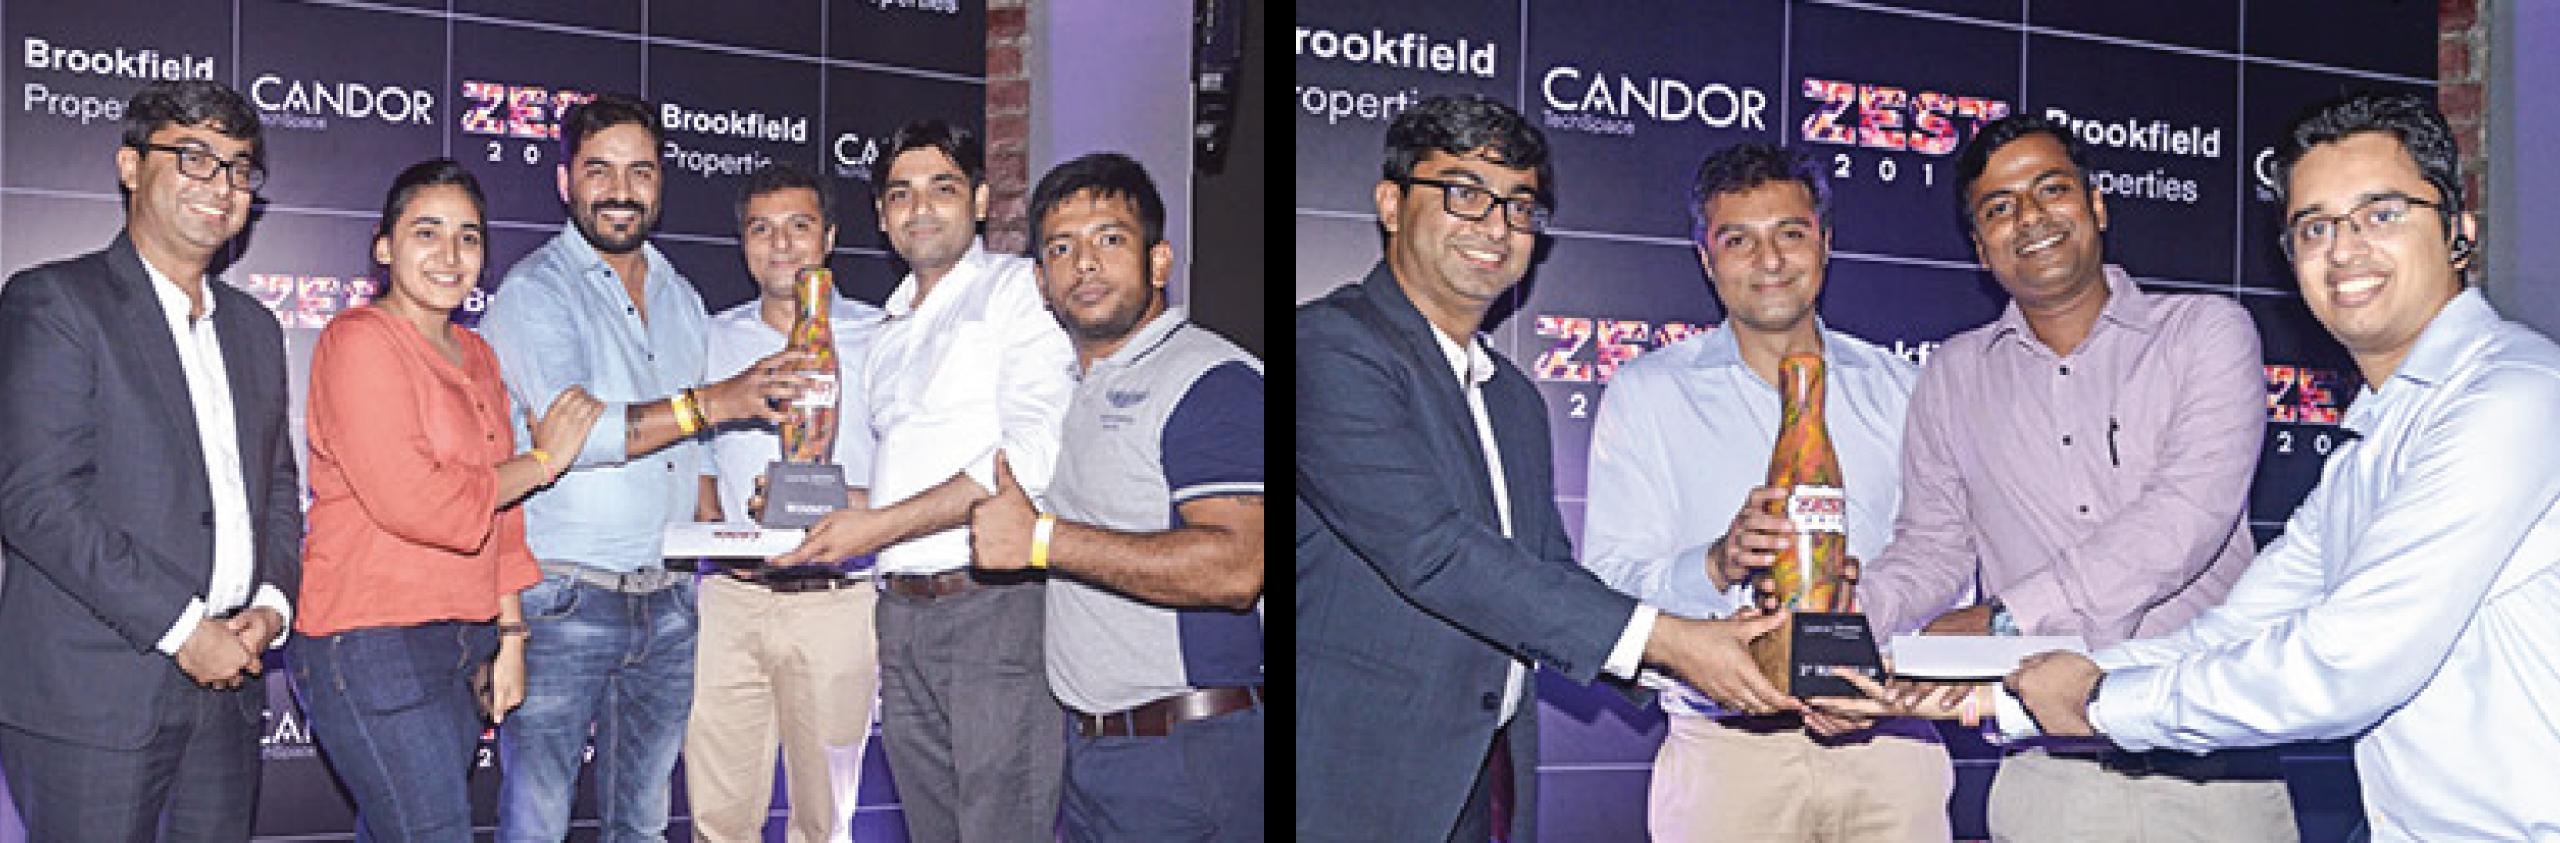 Team spirit at its best & The winners - Candor TechSpace